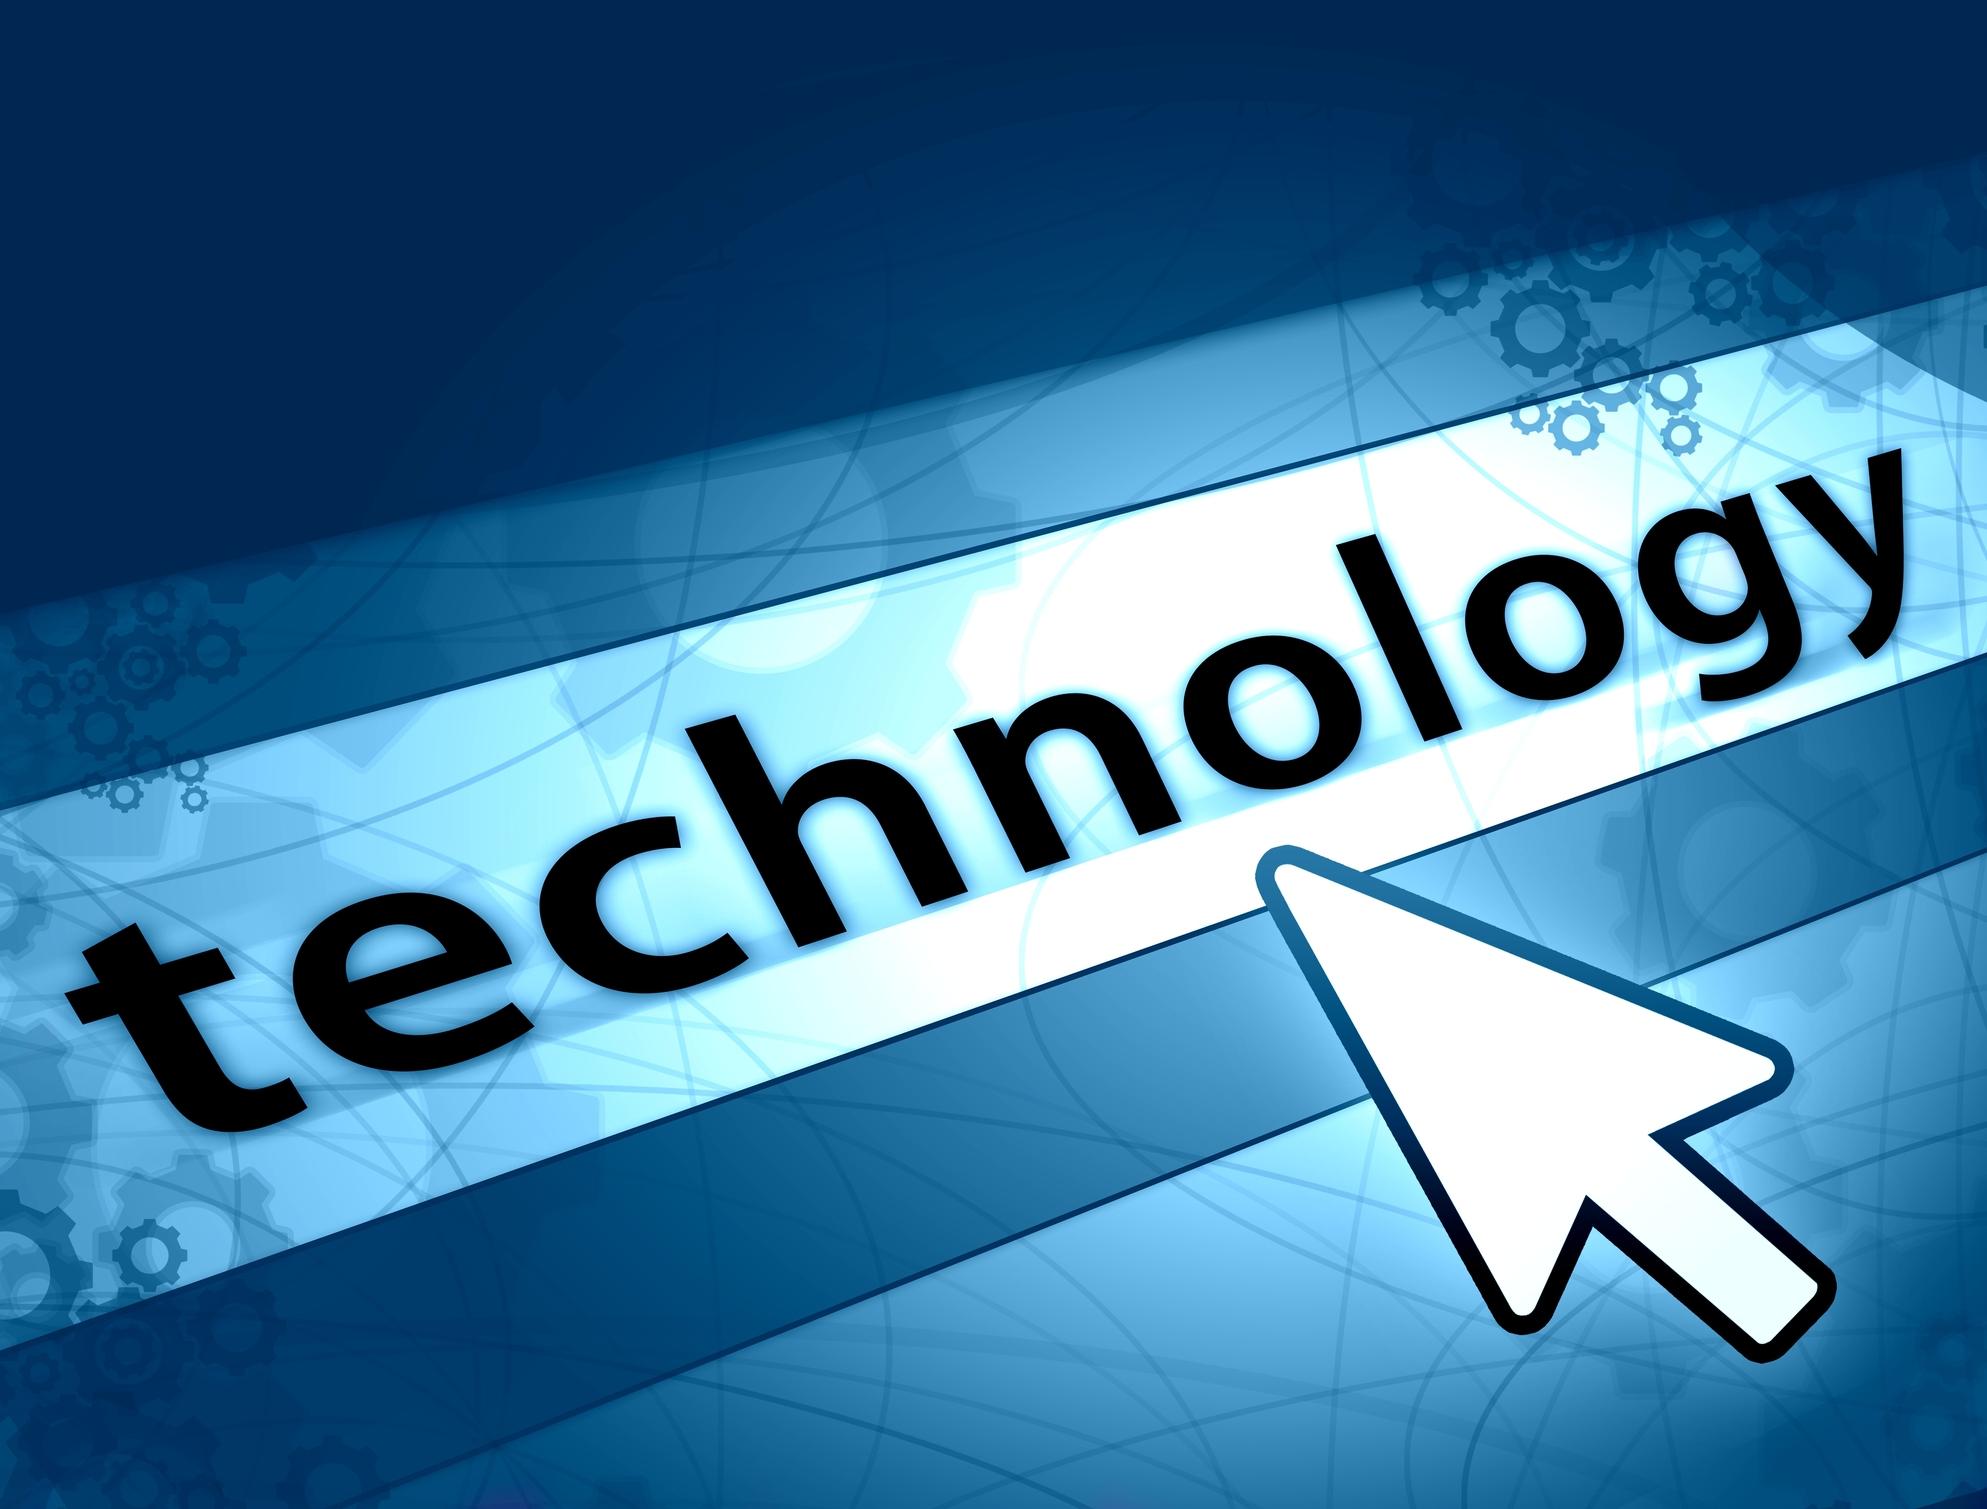 30 Women Defining the Future of Technology - Warner Communications